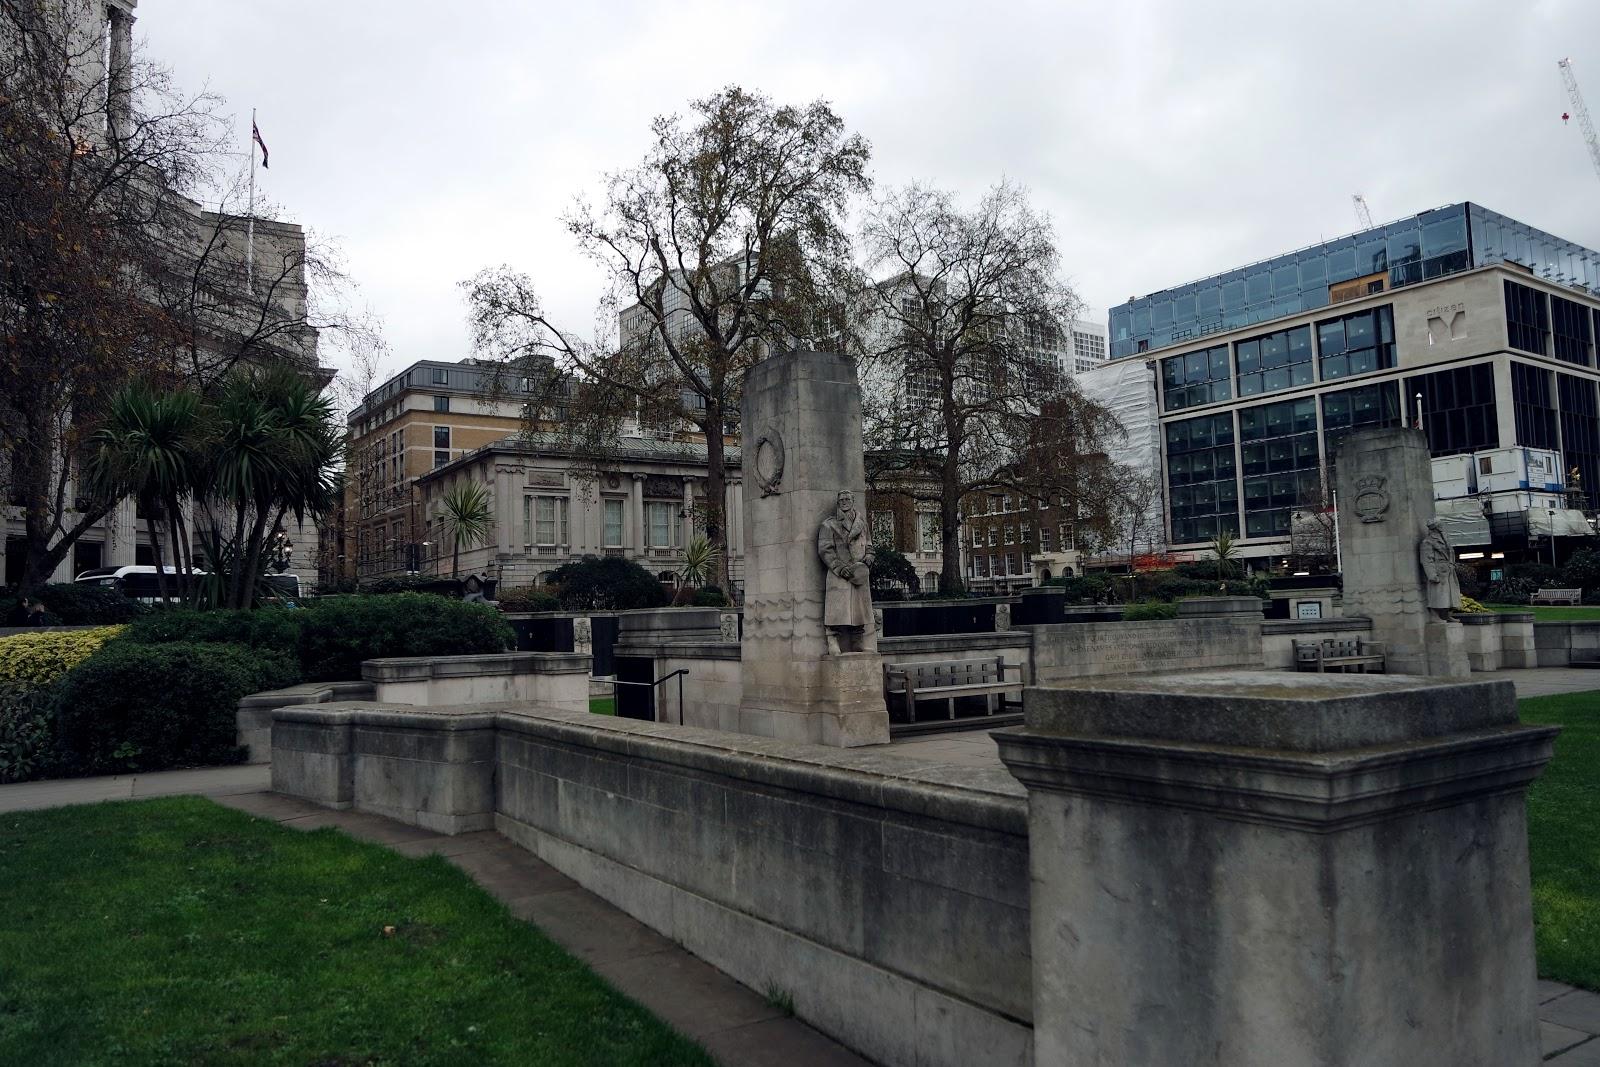 Trinity garden, London, blog, Londres, South Bank, City of London, London street,